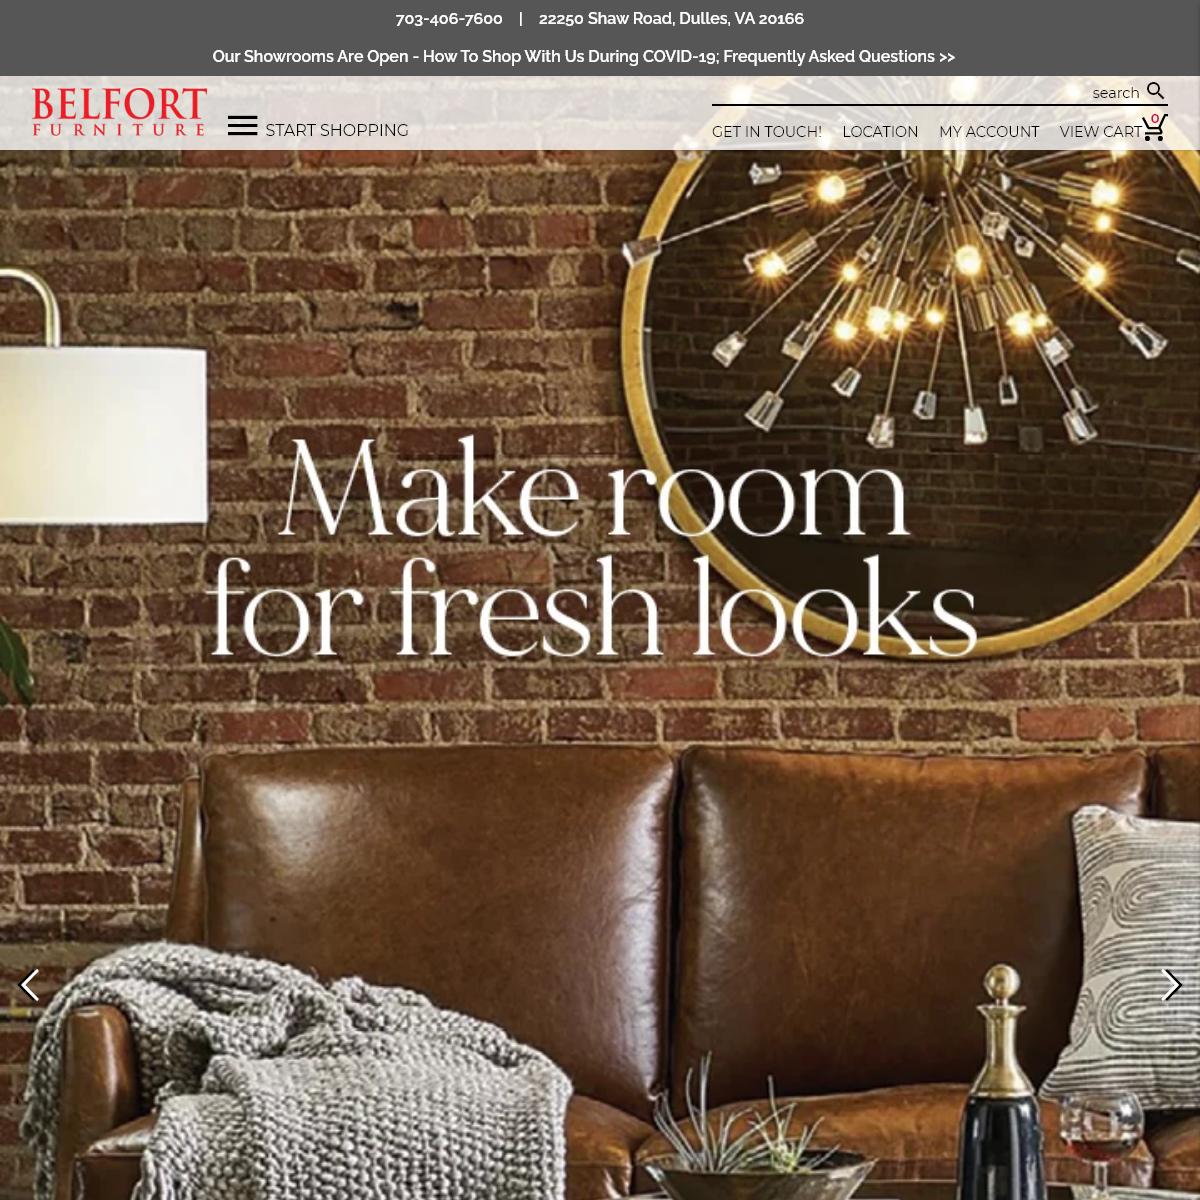 Belfort Furniture - Washington DC, Northern Virginia, Maryland and Fairfax VA Furniture & Mattress Store